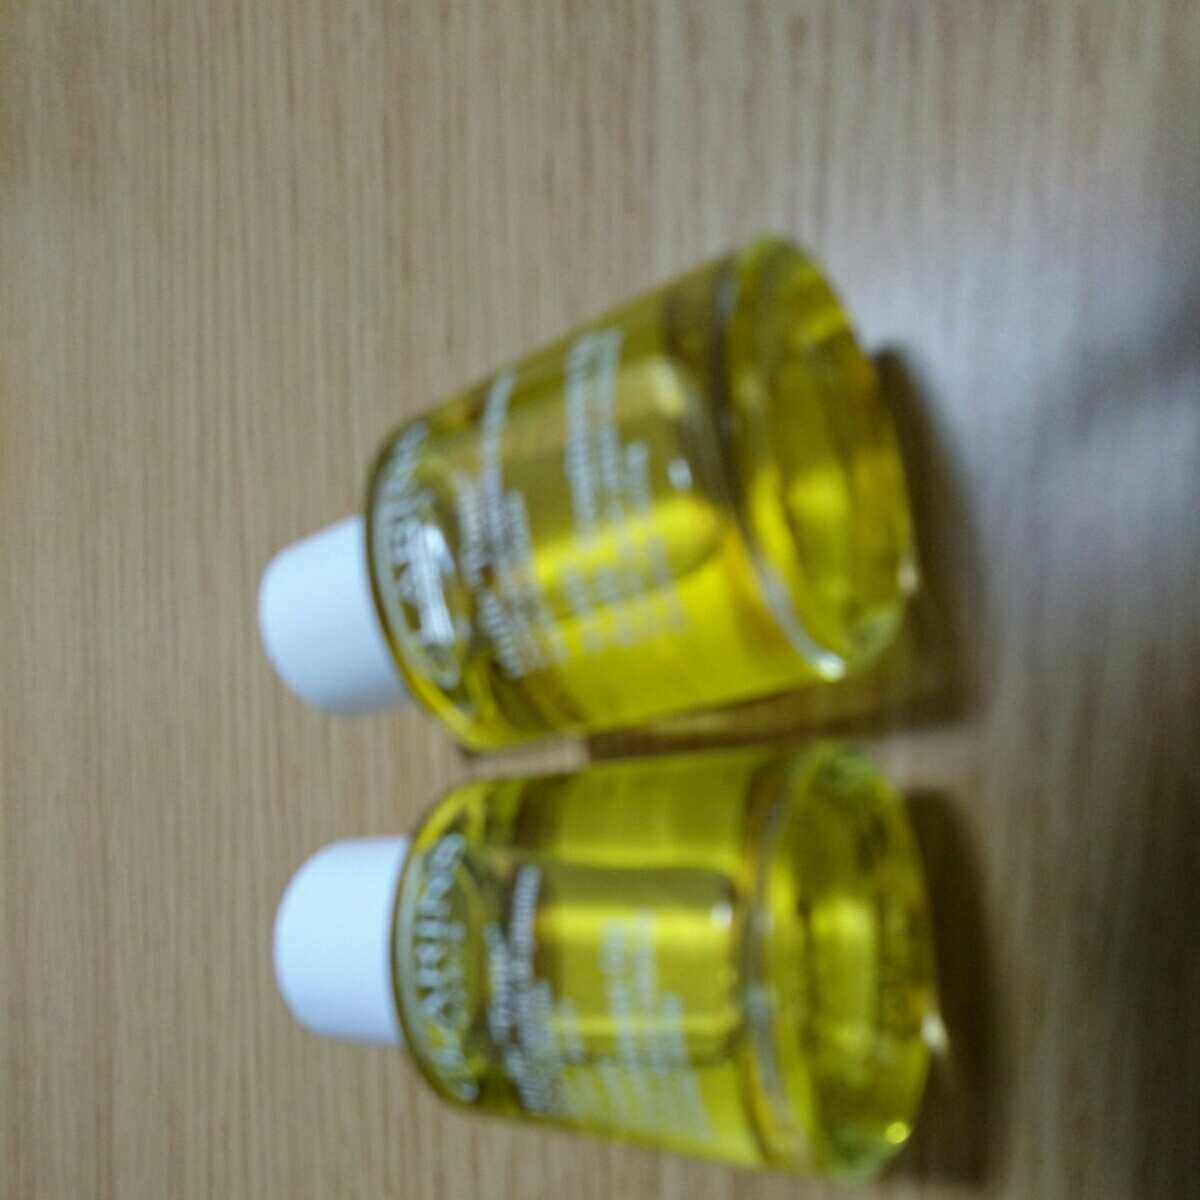 Clarins CLARINS Body Oil Tonic 30 ml × 2 present Unused